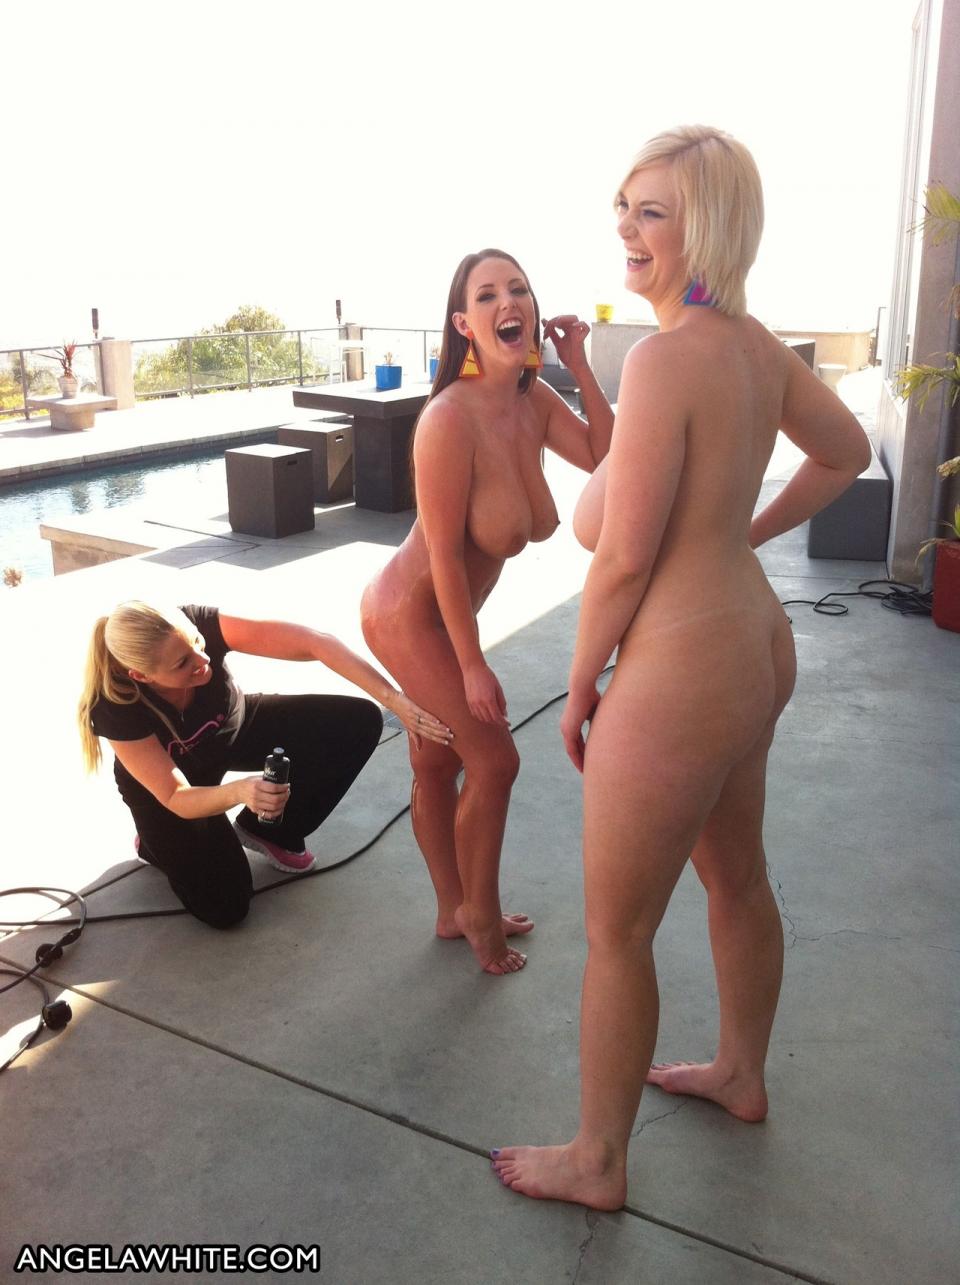 Behind Porn 84